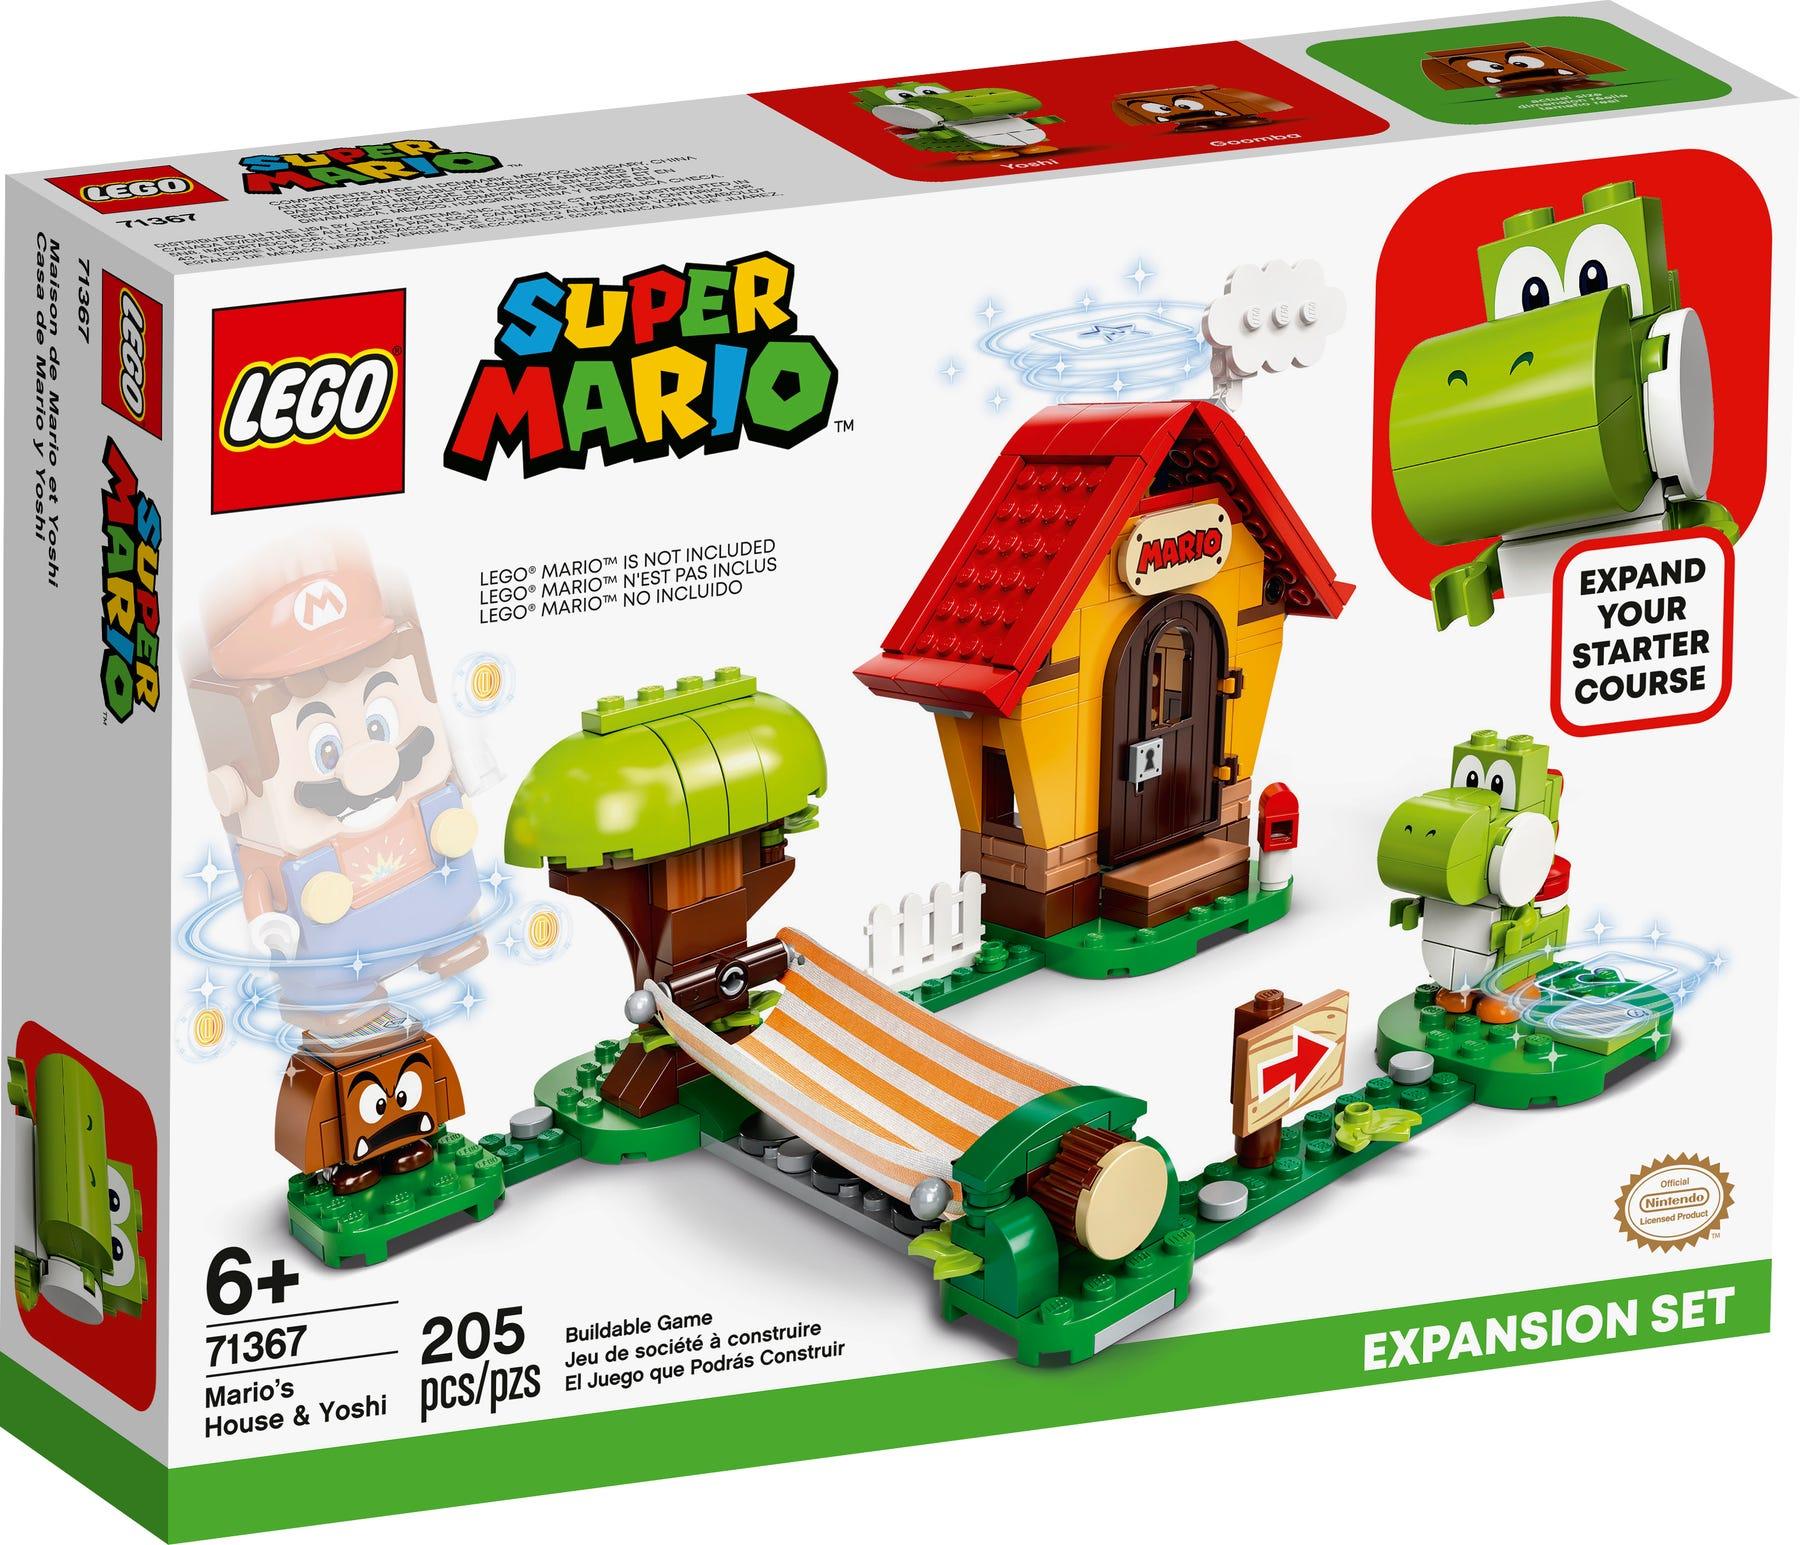 Mario Lego sets £20 @ B&M (Castleford) - E.G Mario's House & Yoshi Expansion Set